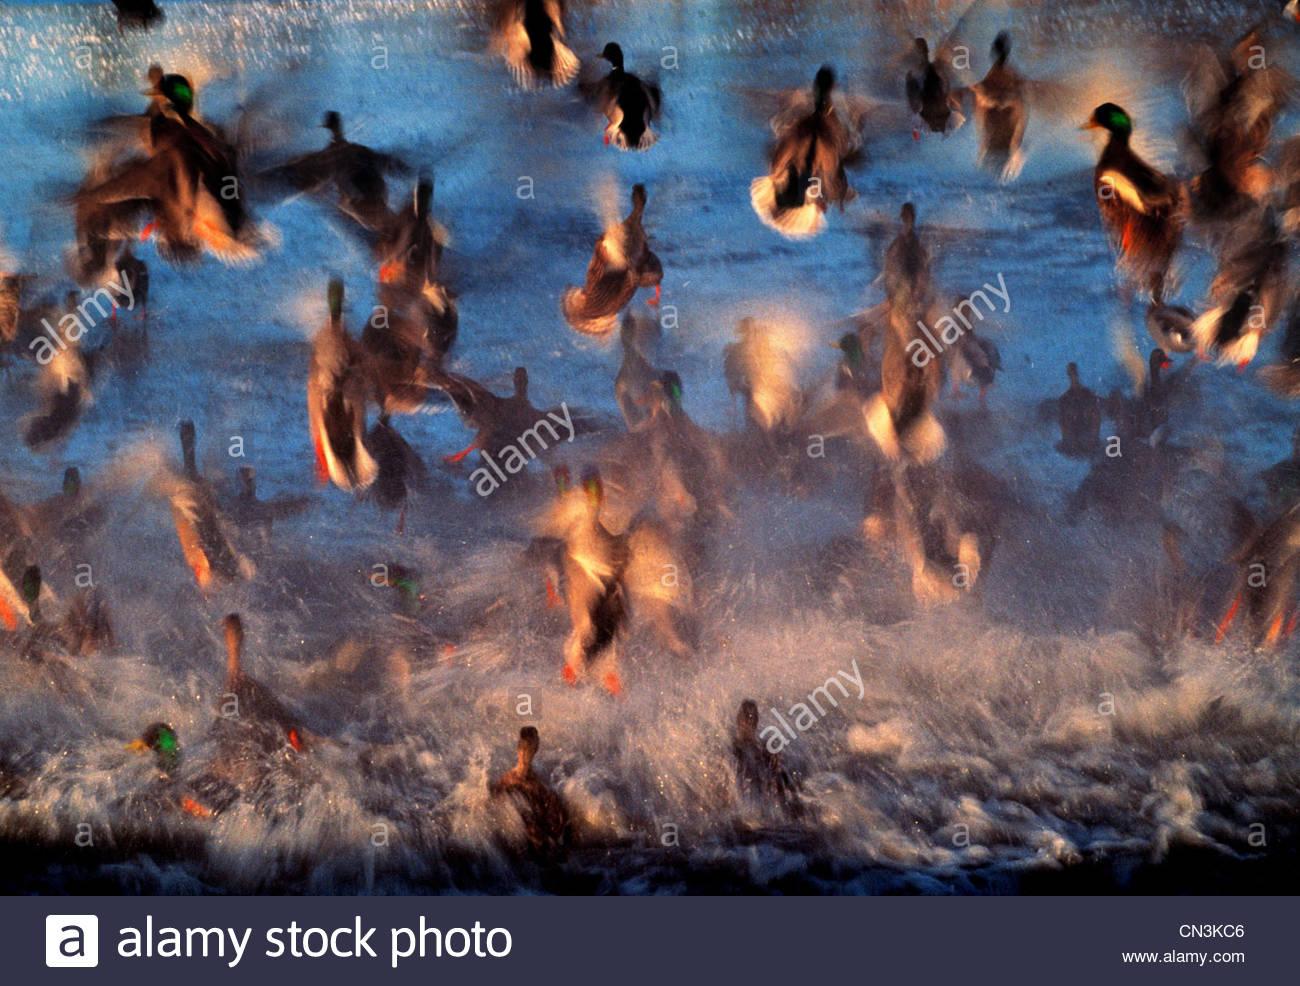 Mallard ducks, Fraser River Delta, British Columbia, Canada - Stock Image